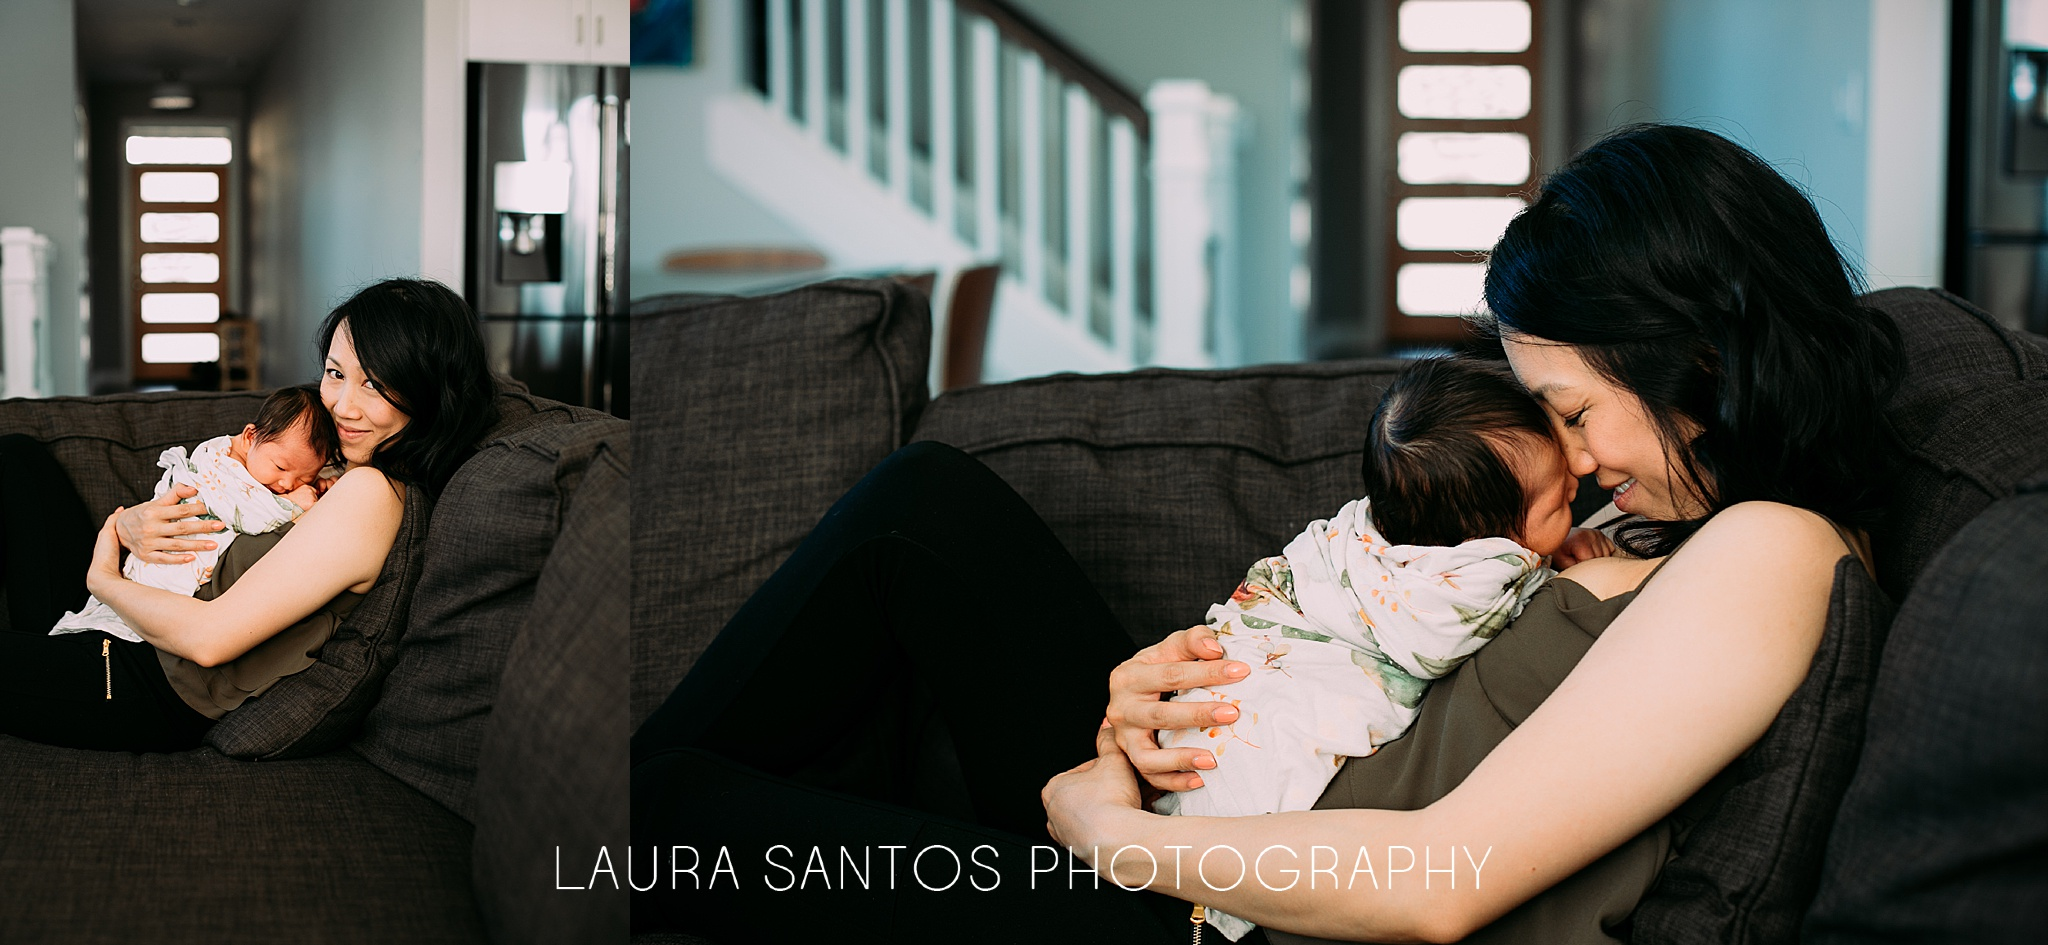 Laura Santos Photography Portland Oregon Family Photographer_0579.jpg